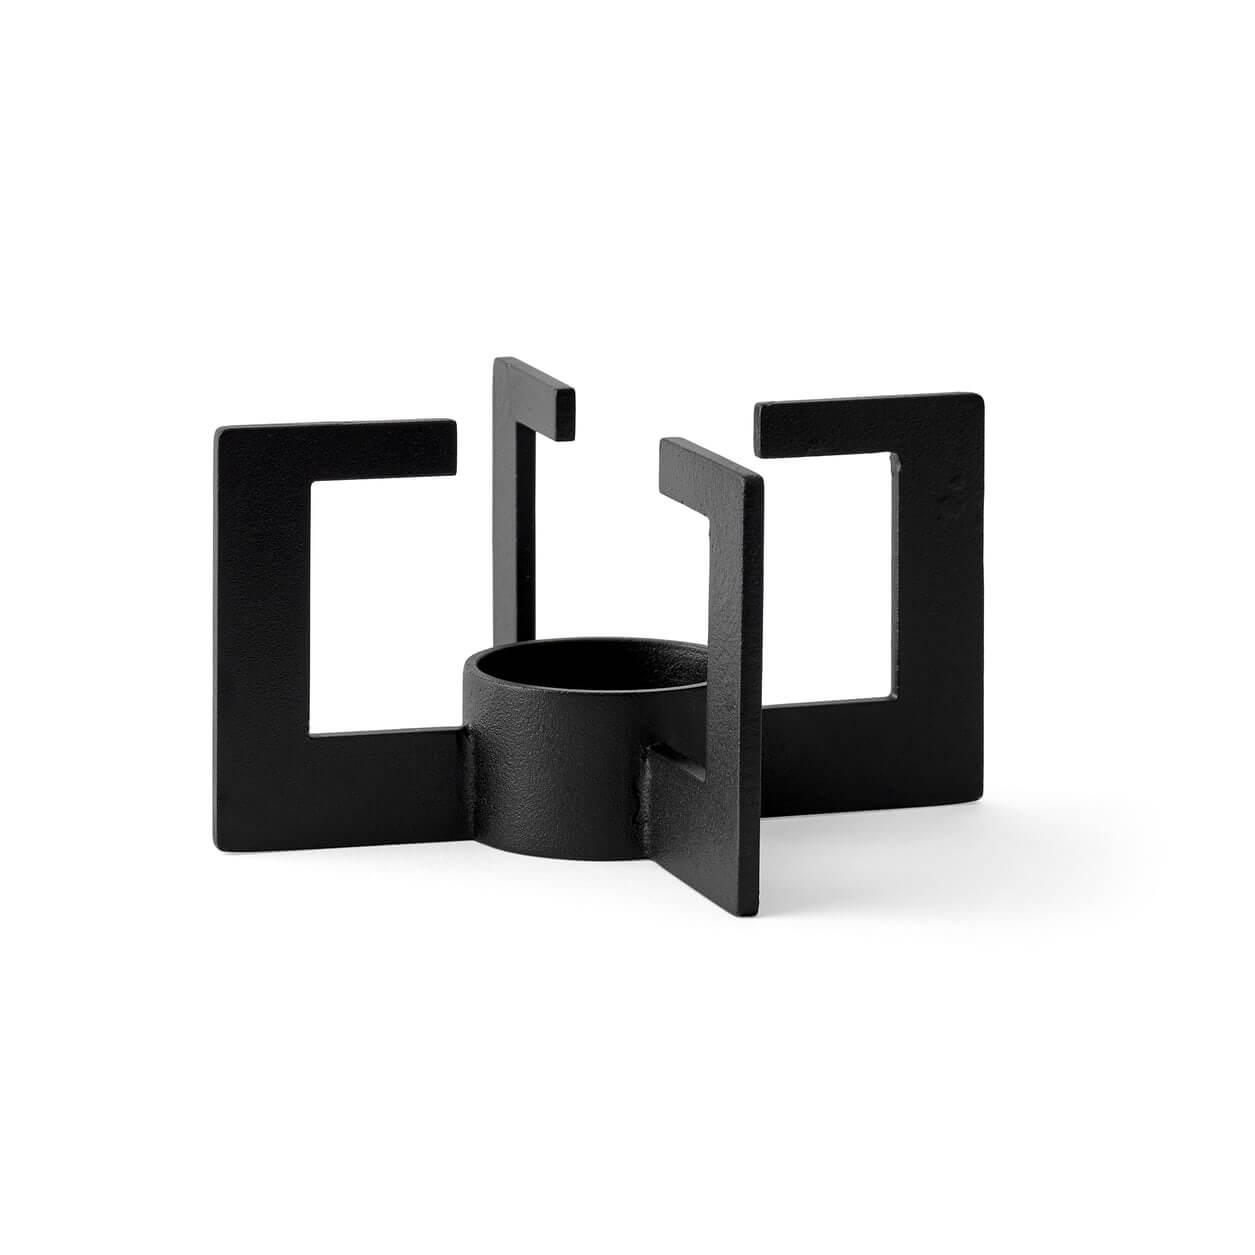 menu st vchen cast f r teekanne schwarz ca 14 5 x h7 6 cm. Black Bedroom Furniture Sets. Home Design Ideas